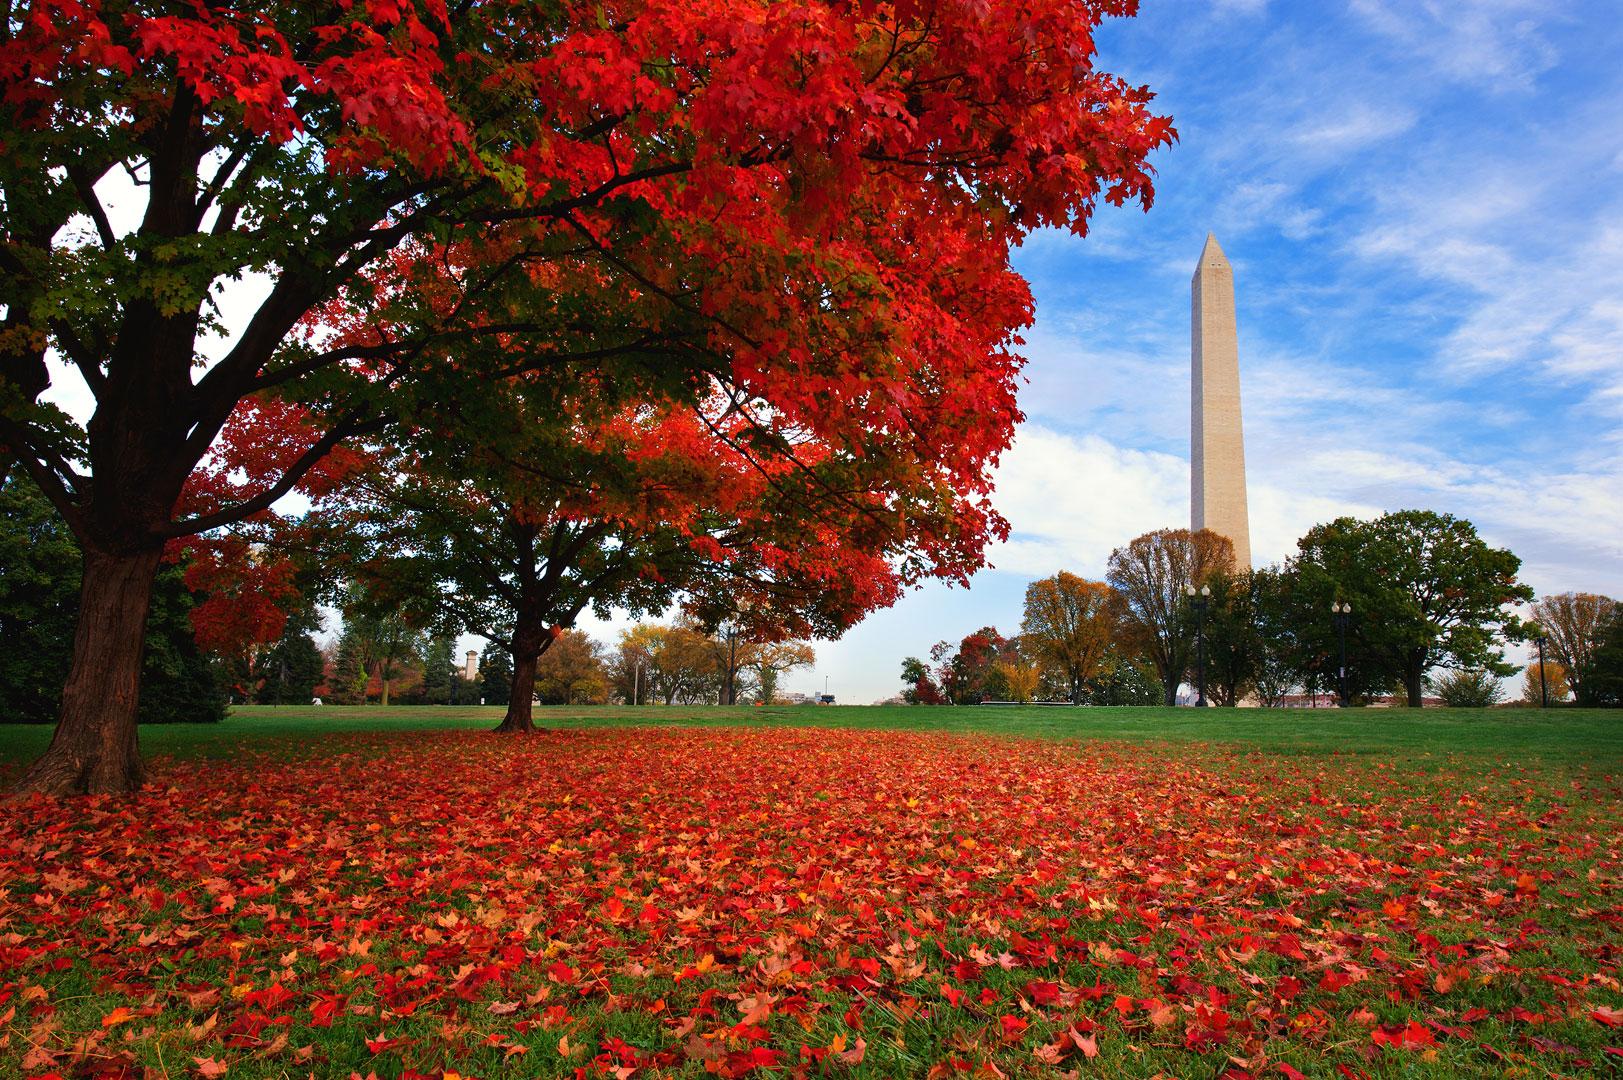 Washington DC, Washington Monument, Autumn, Fall Season, Color, Red Maple, Blue Skies, District of Columbia, Tidal Basin, photo